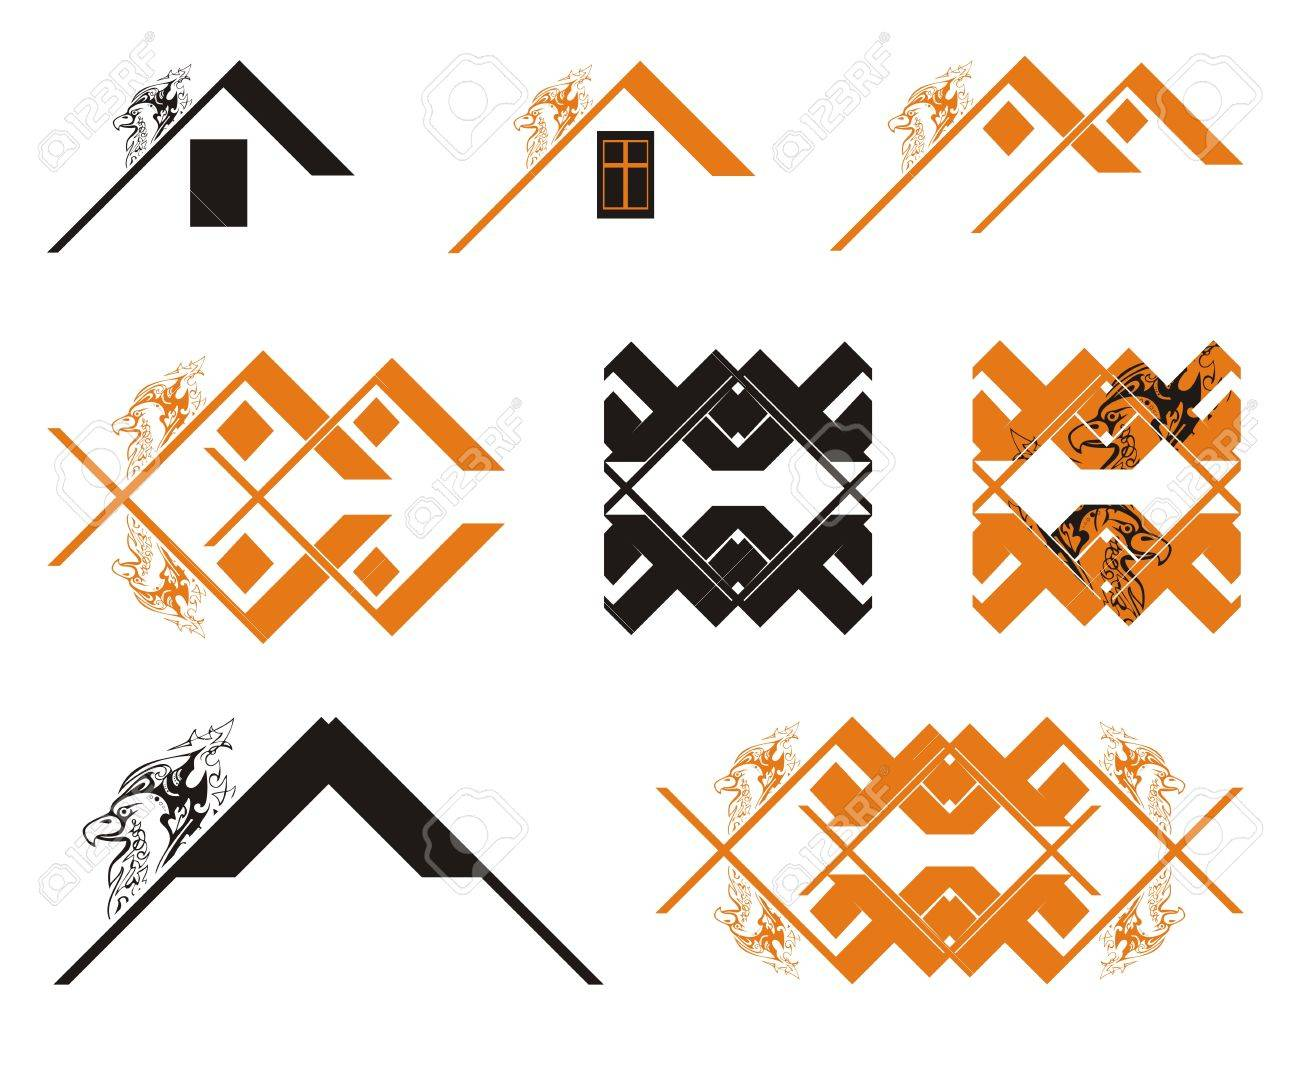 Black And Orange Eagle House Concept The Decorative Symbols